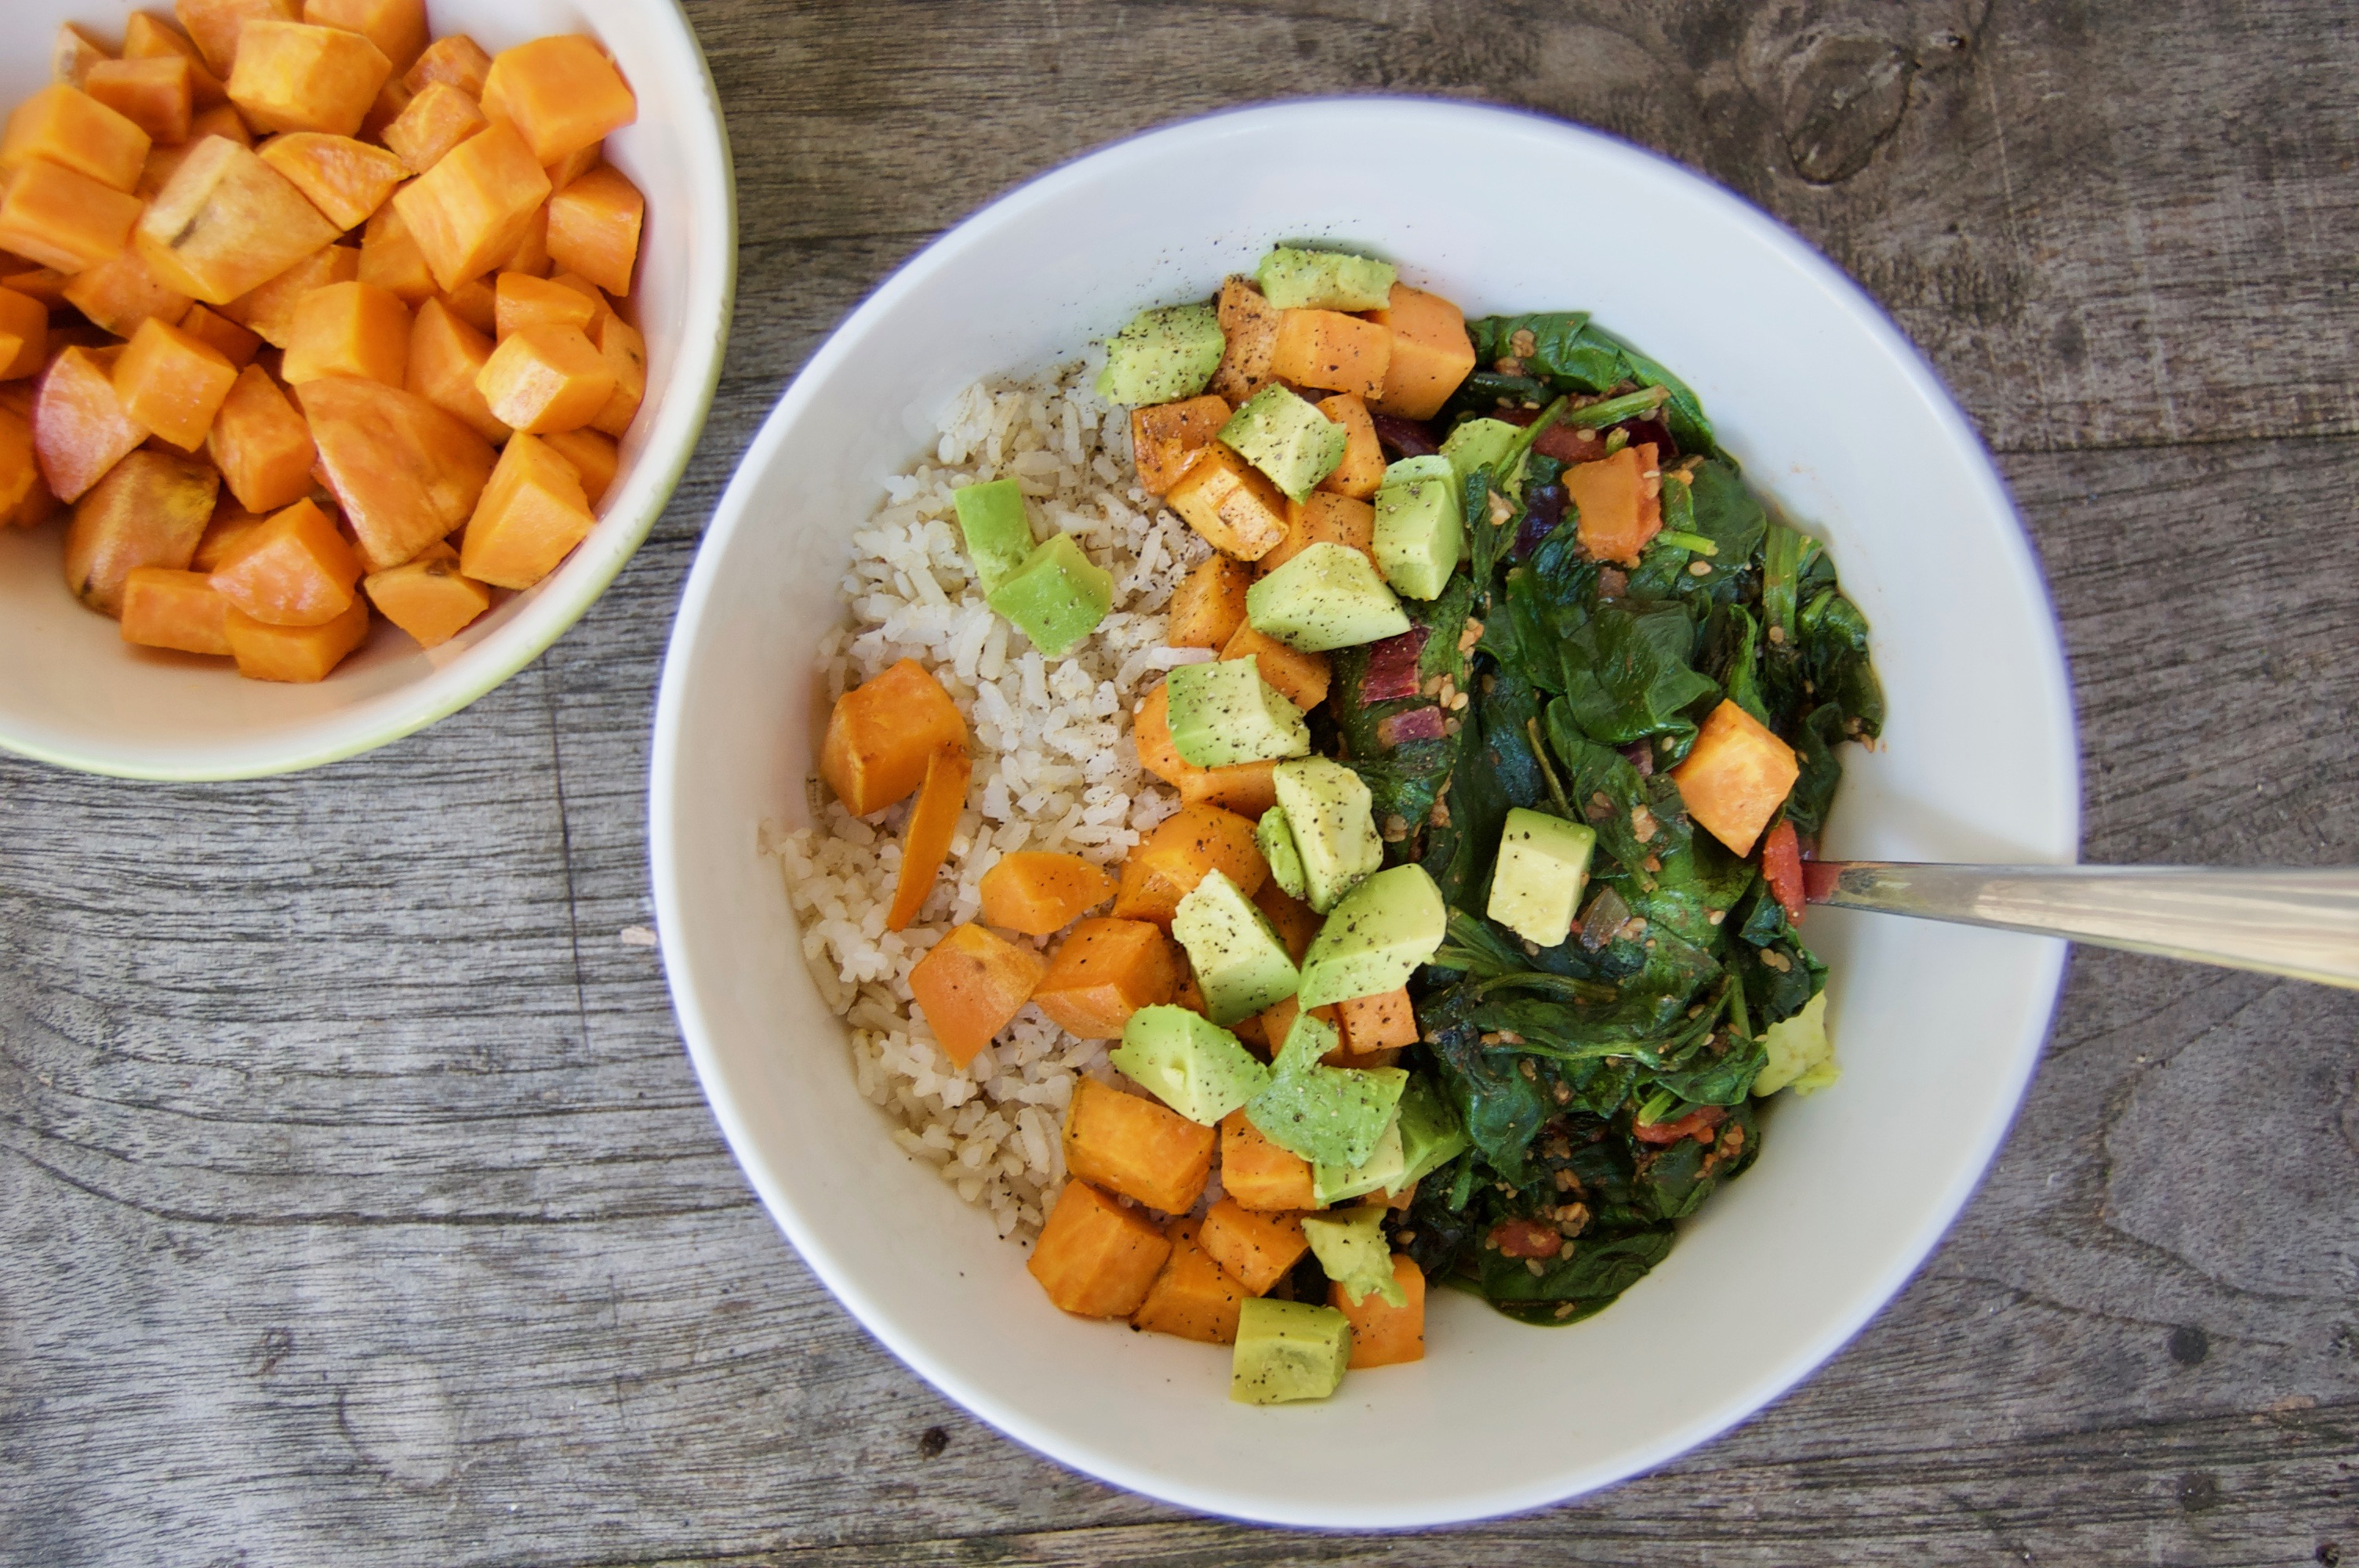 recept vegan smaaksouvenirs